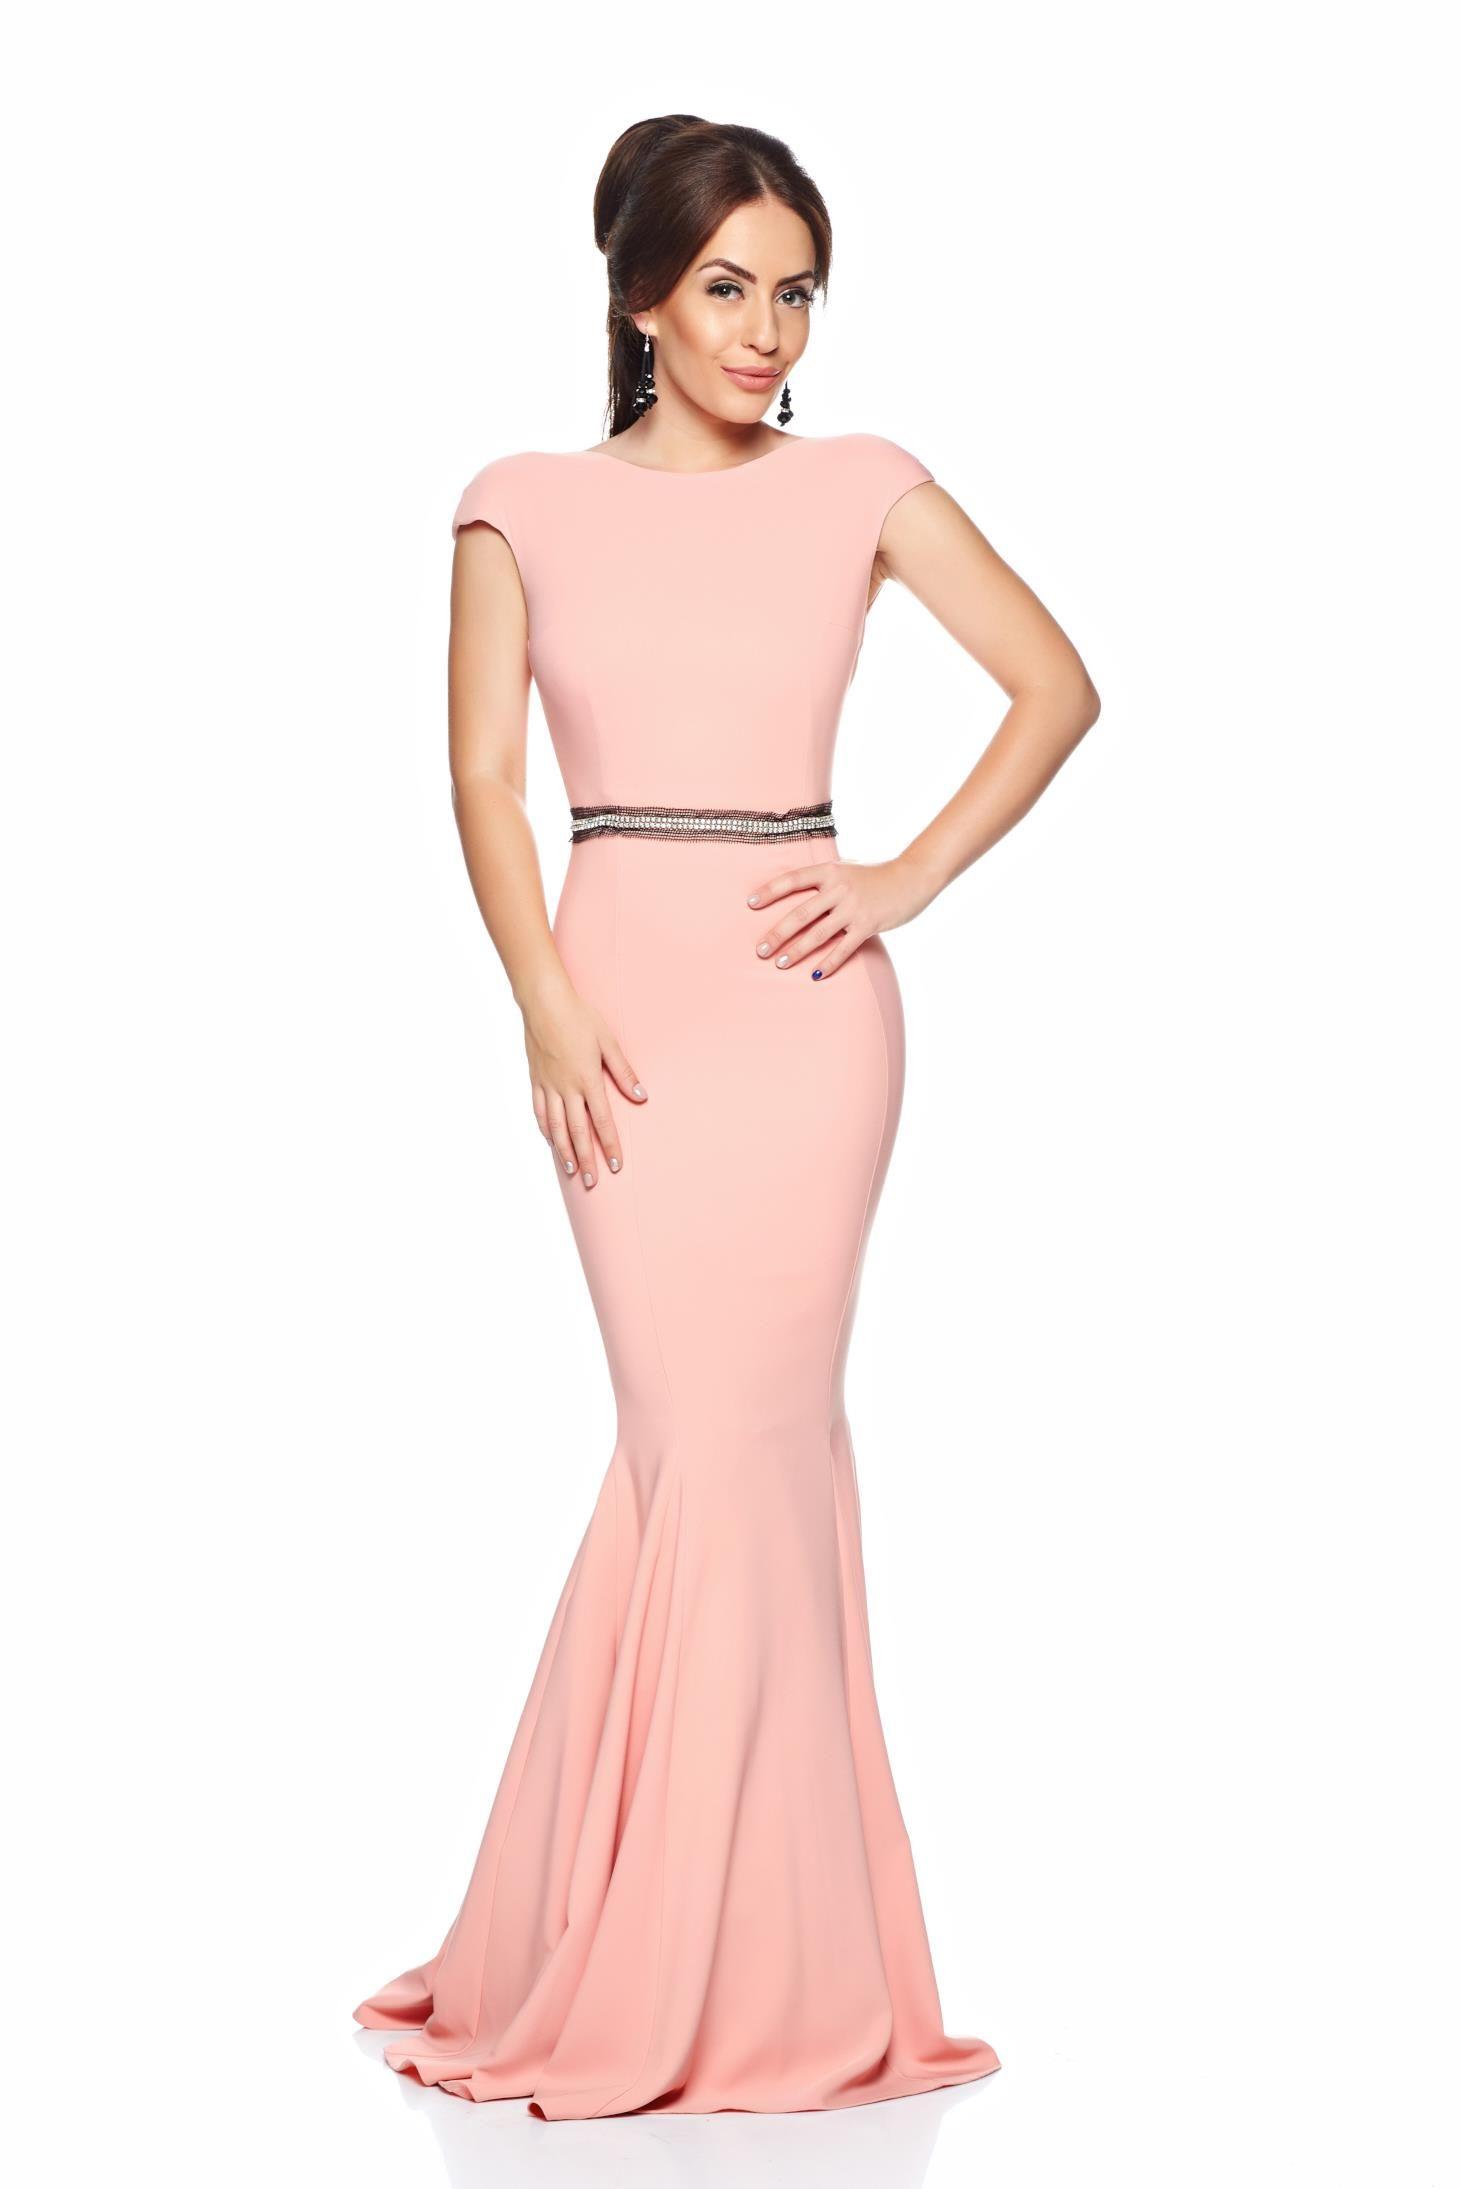 Artista Sugar Love Rosa Dress, mermaid dress, embellished ...